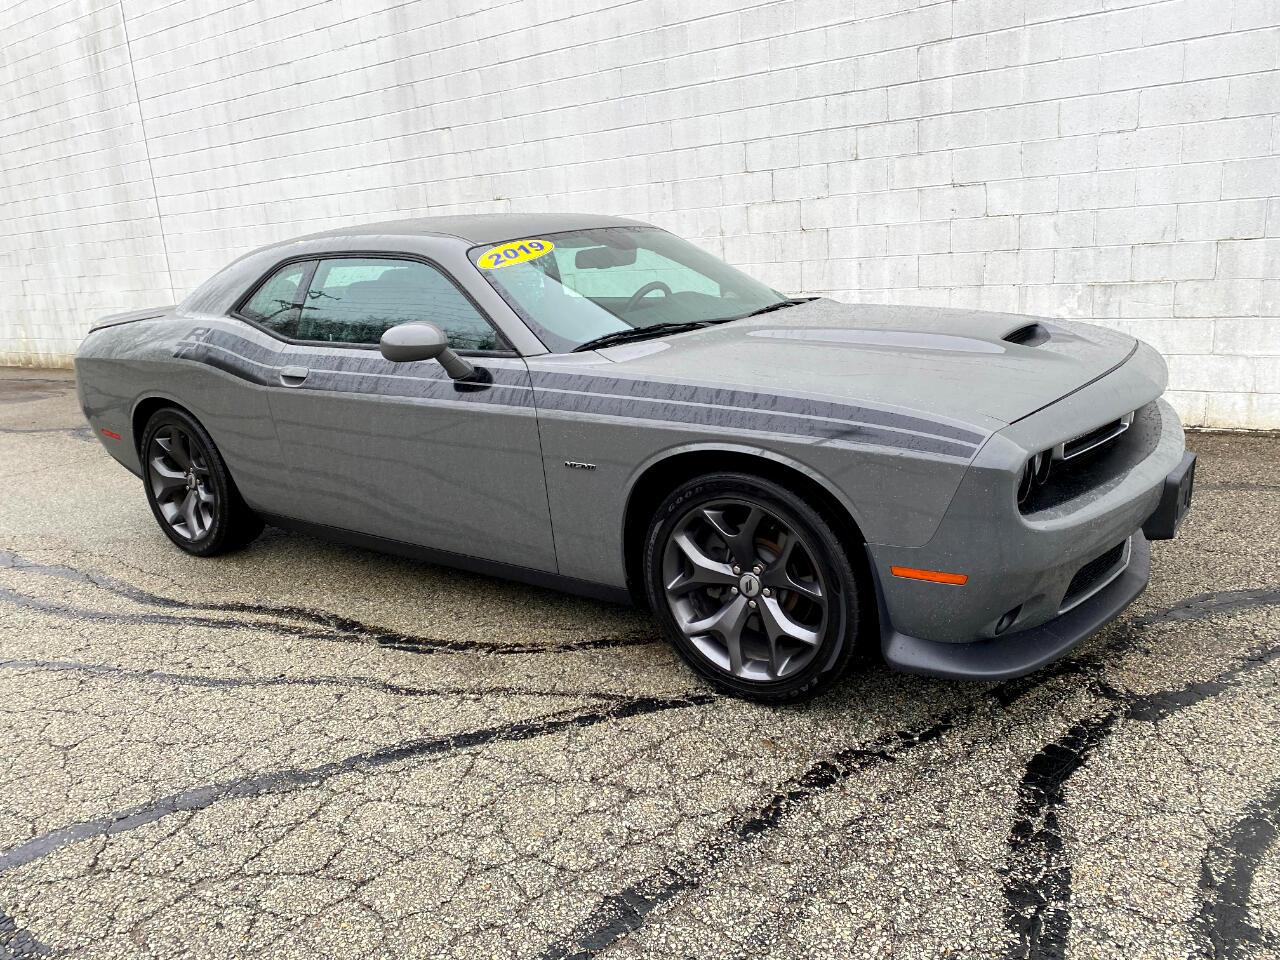 Dodge Challenger 2dr Cpe R/T 2019